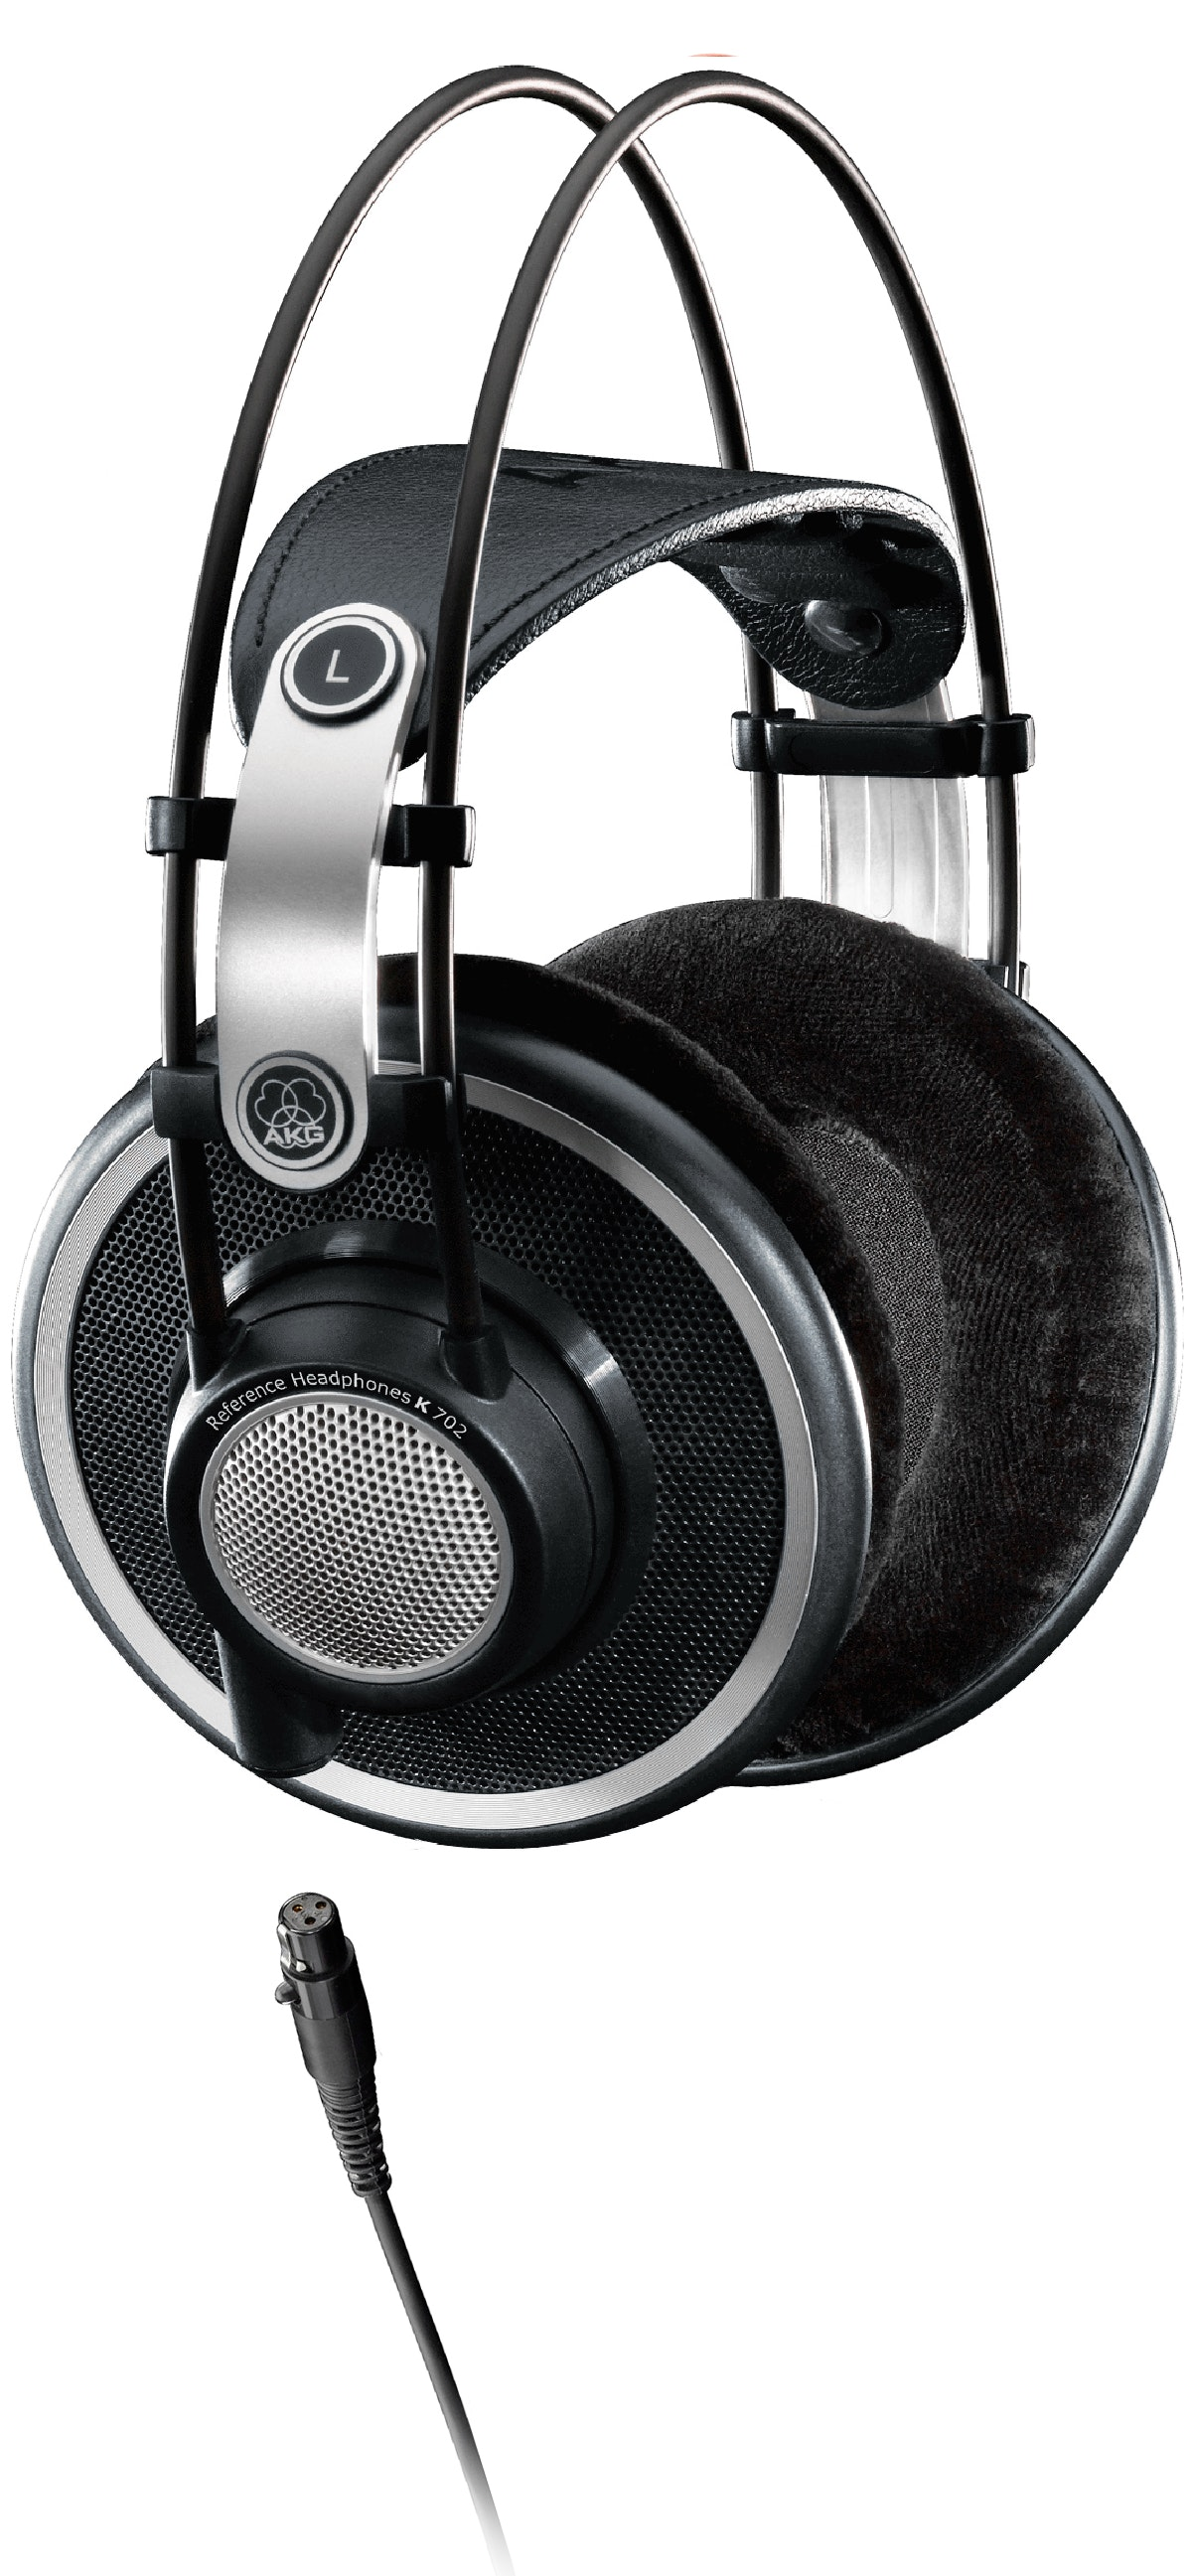 K702 - Reference studio headphones | AKG Acoustics